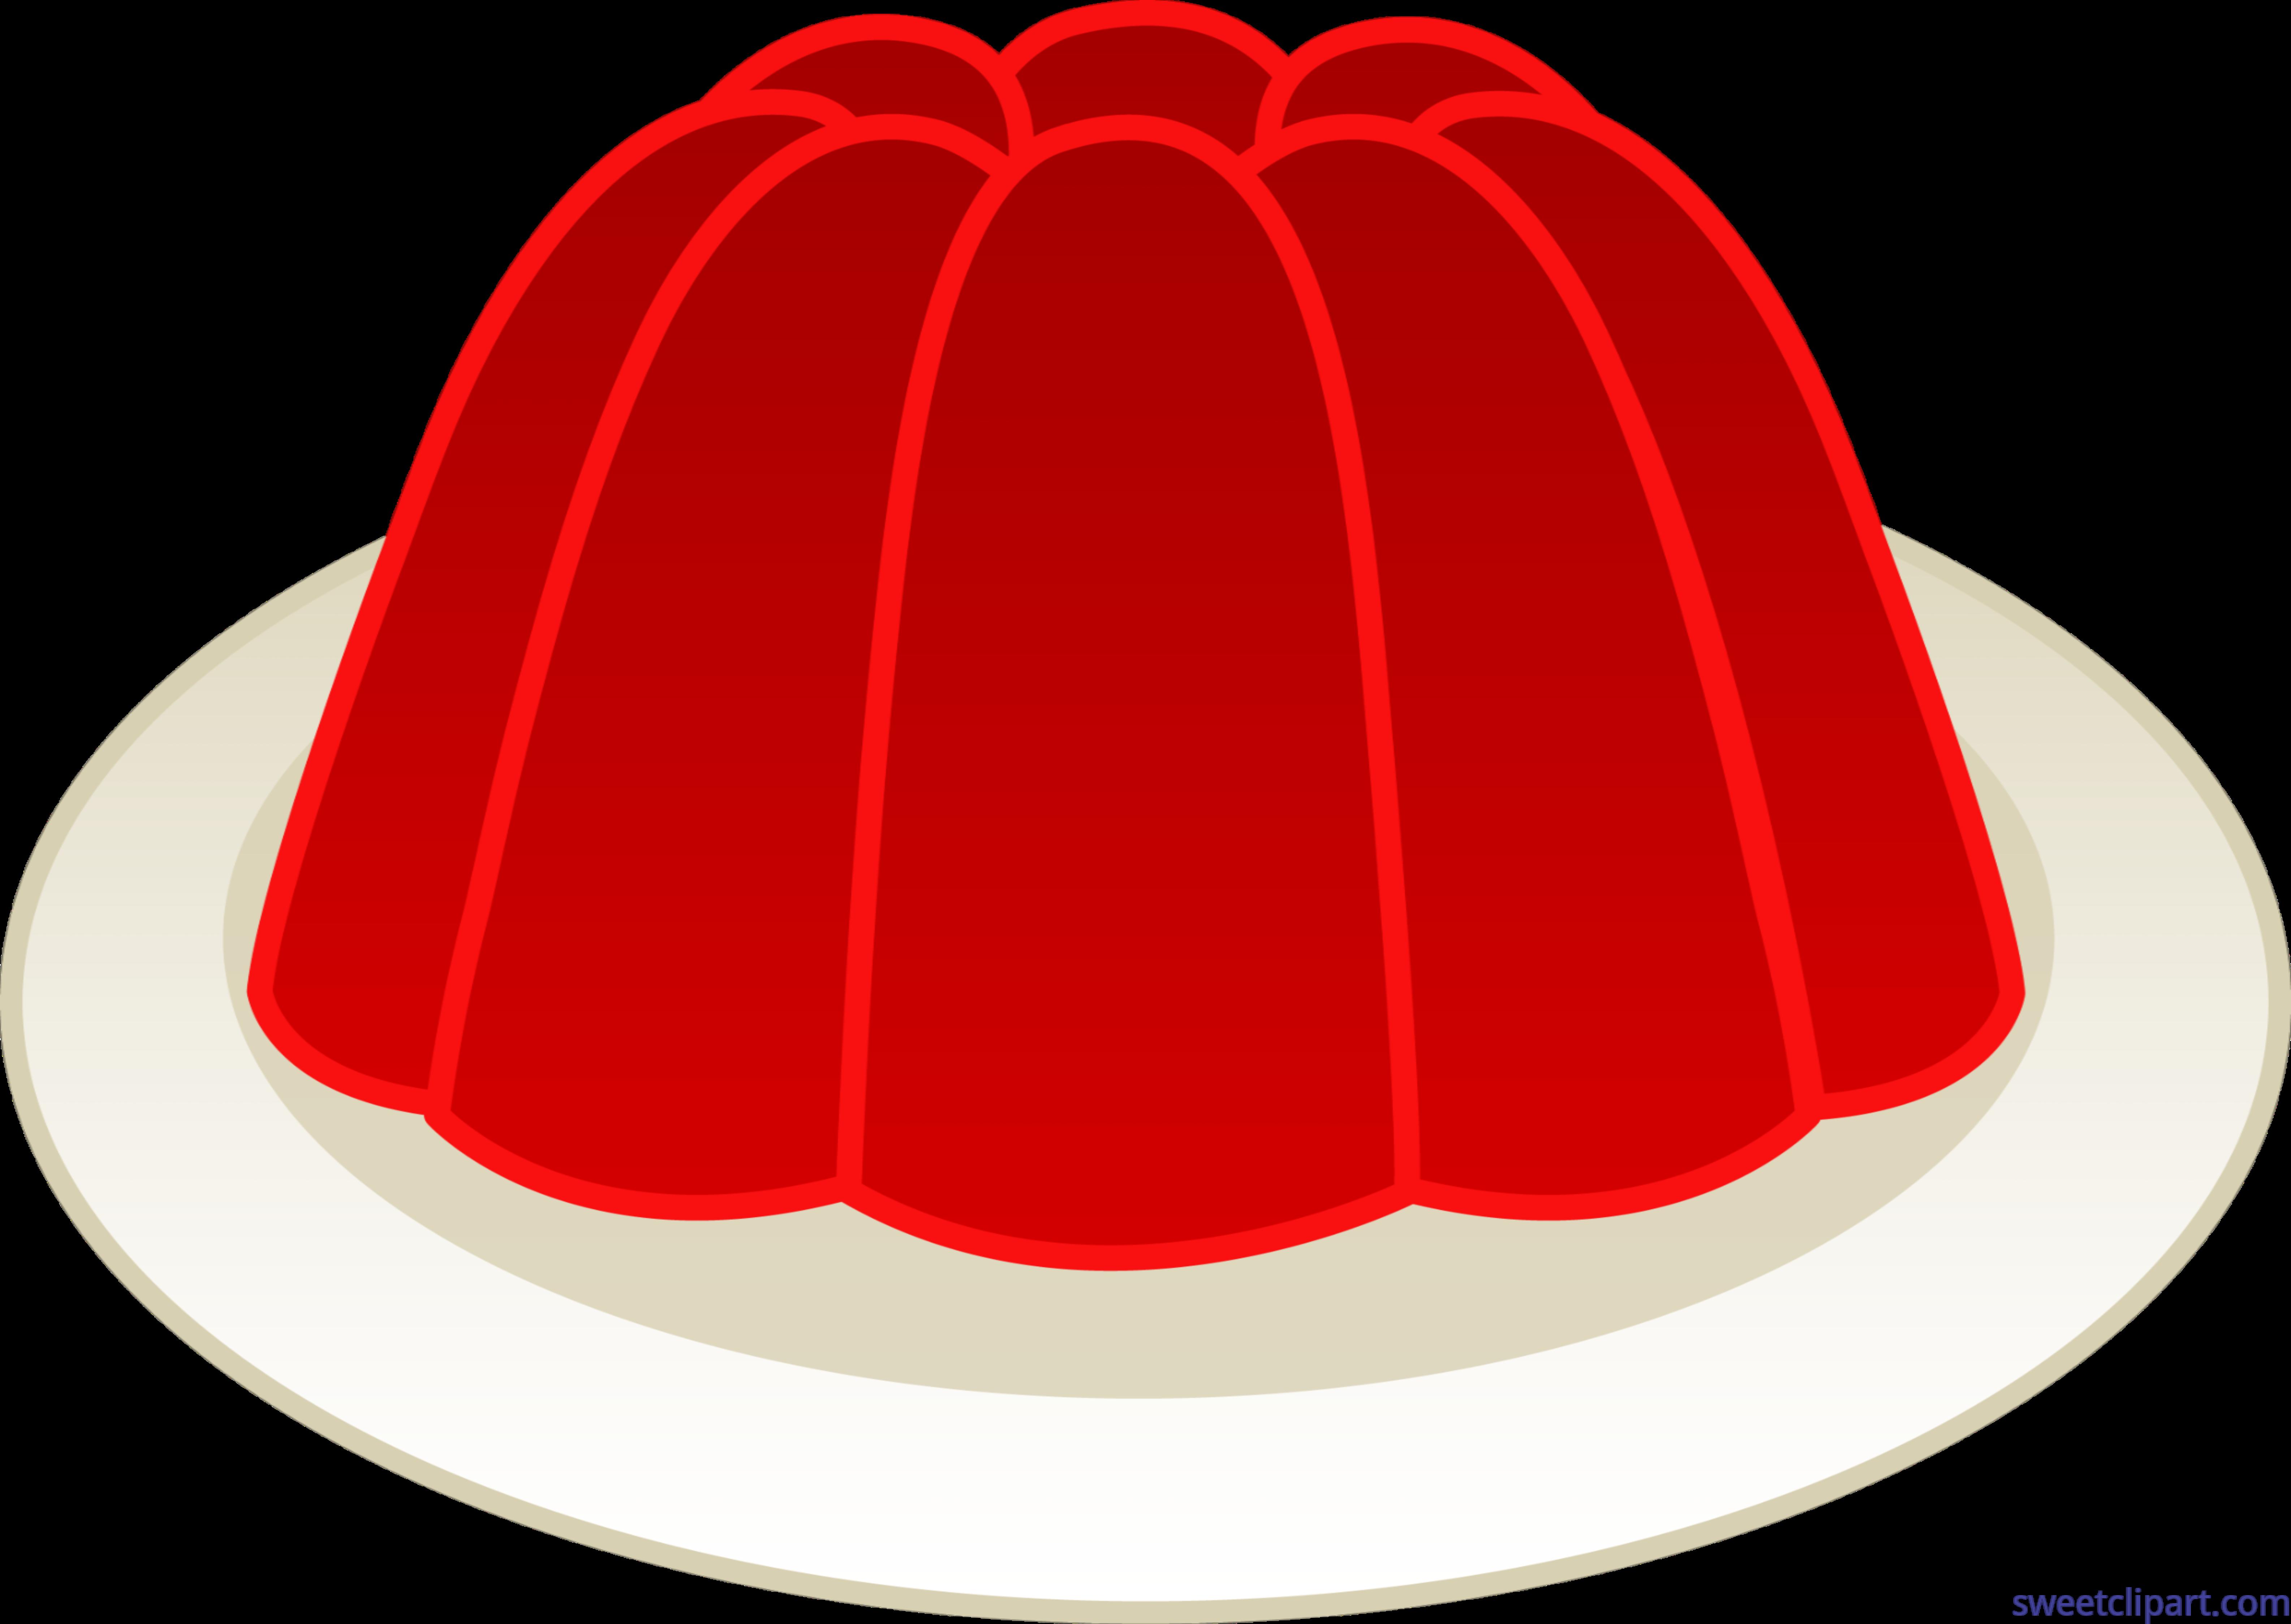 6341x4496 Gelatin Mold Cherry Clip Art